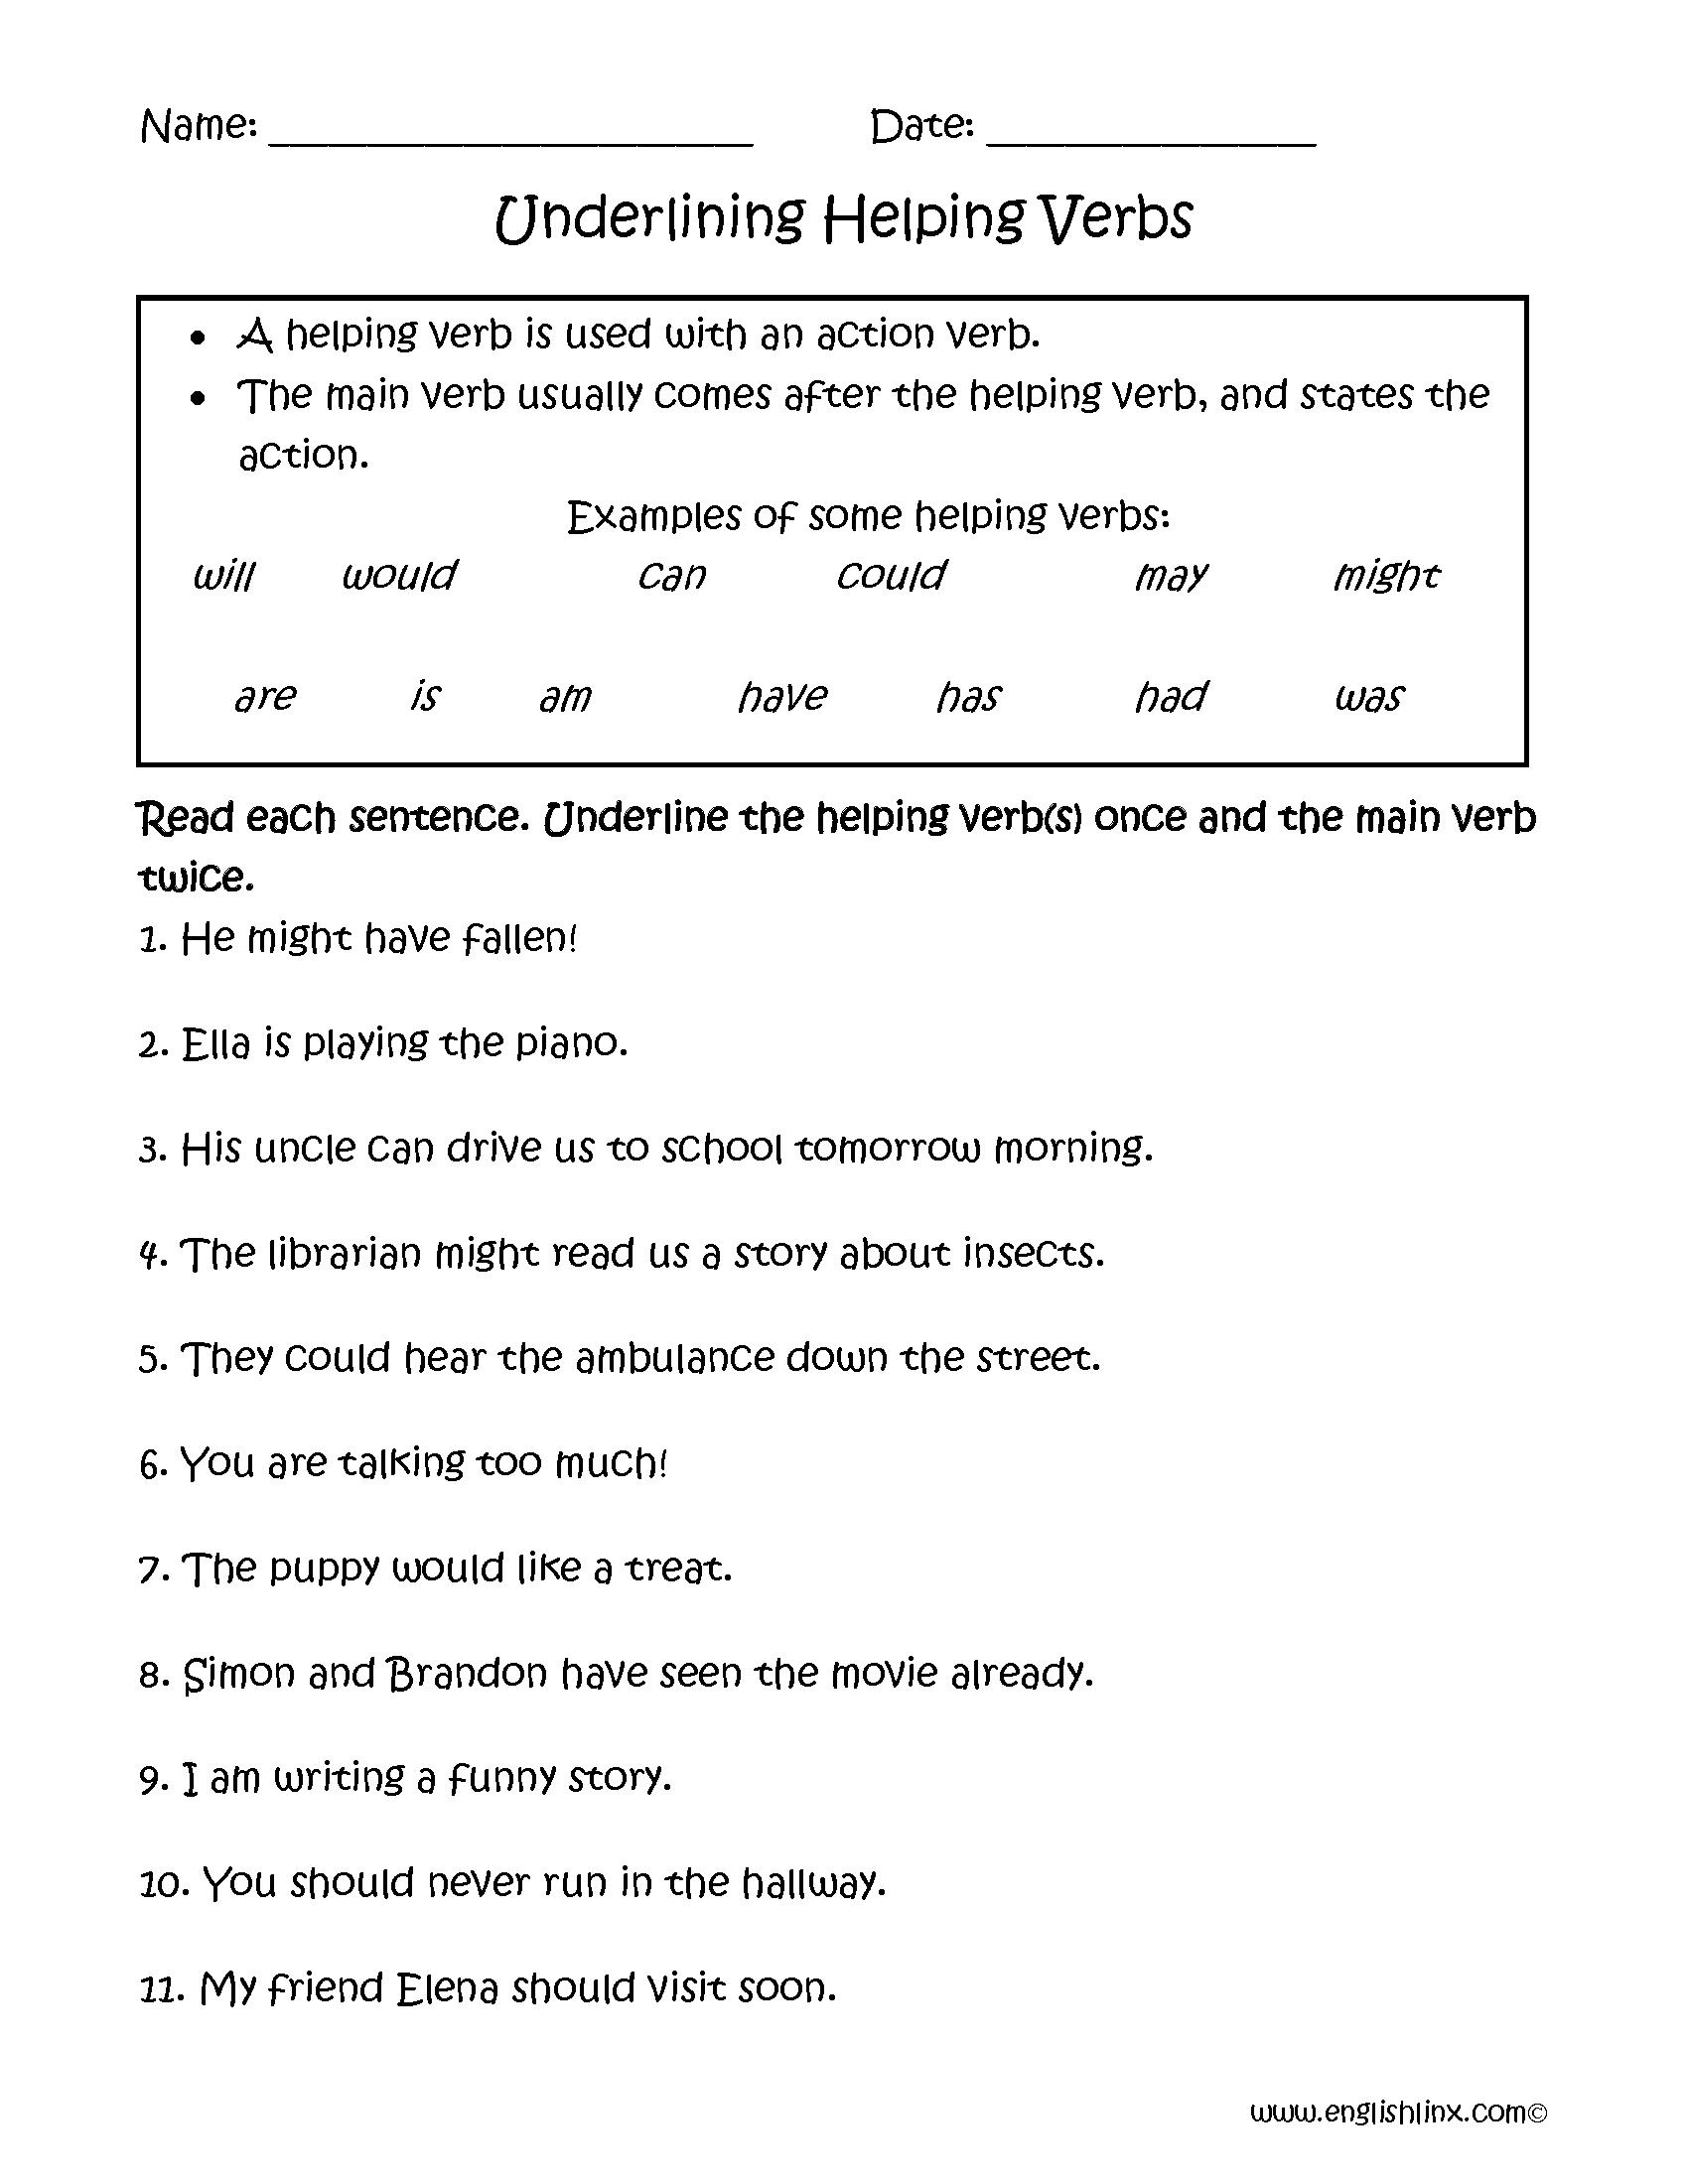 hight resolution of Underlining Helping Verbs Worksheets   Helping verbs